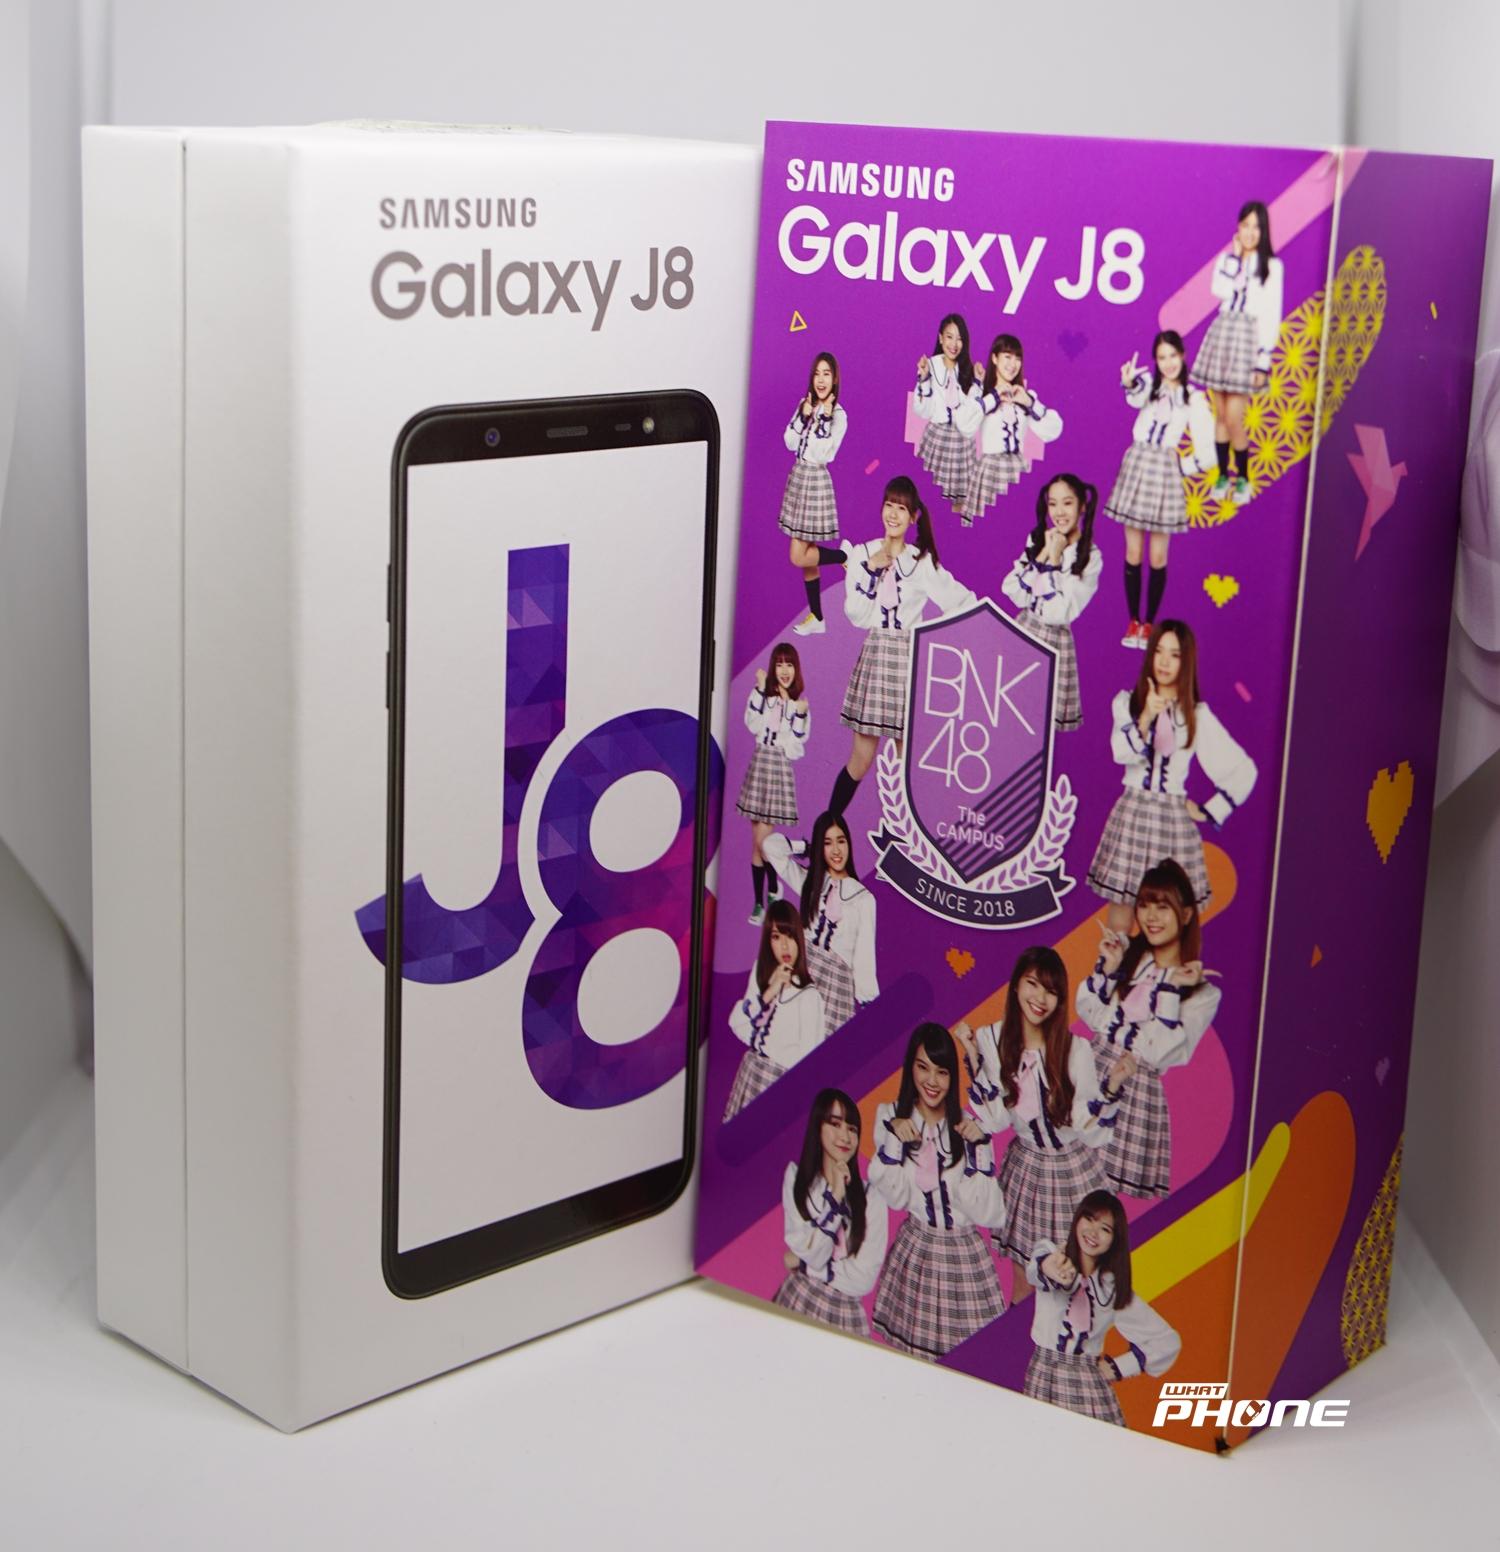 Samsung Galaxy J8 BNK48 BOXSET (7)